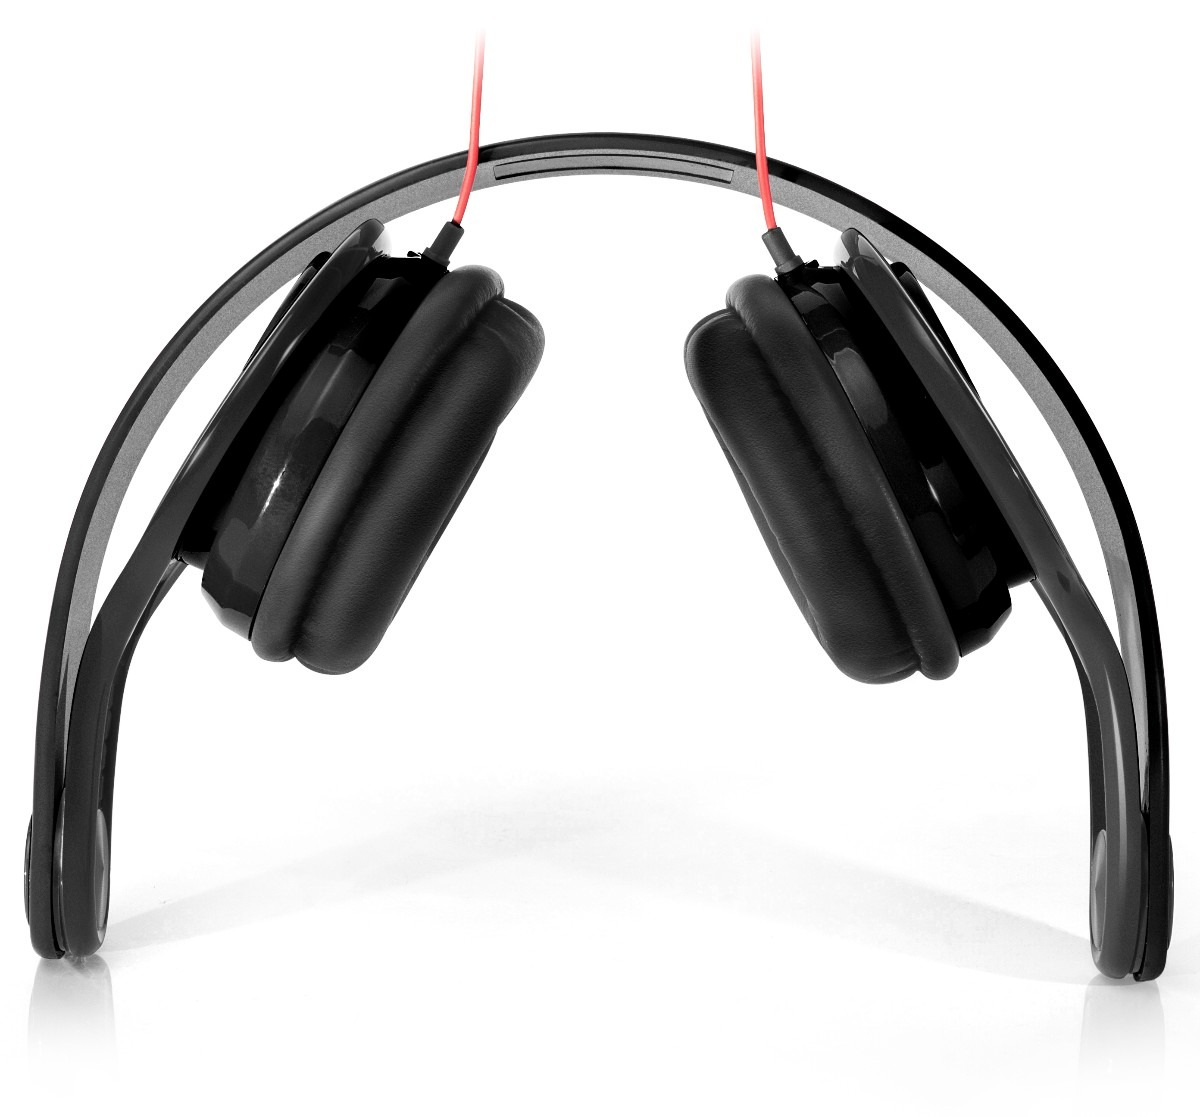 Fone de Ouvido Headphone 360 Preto PH081 - Multilaser